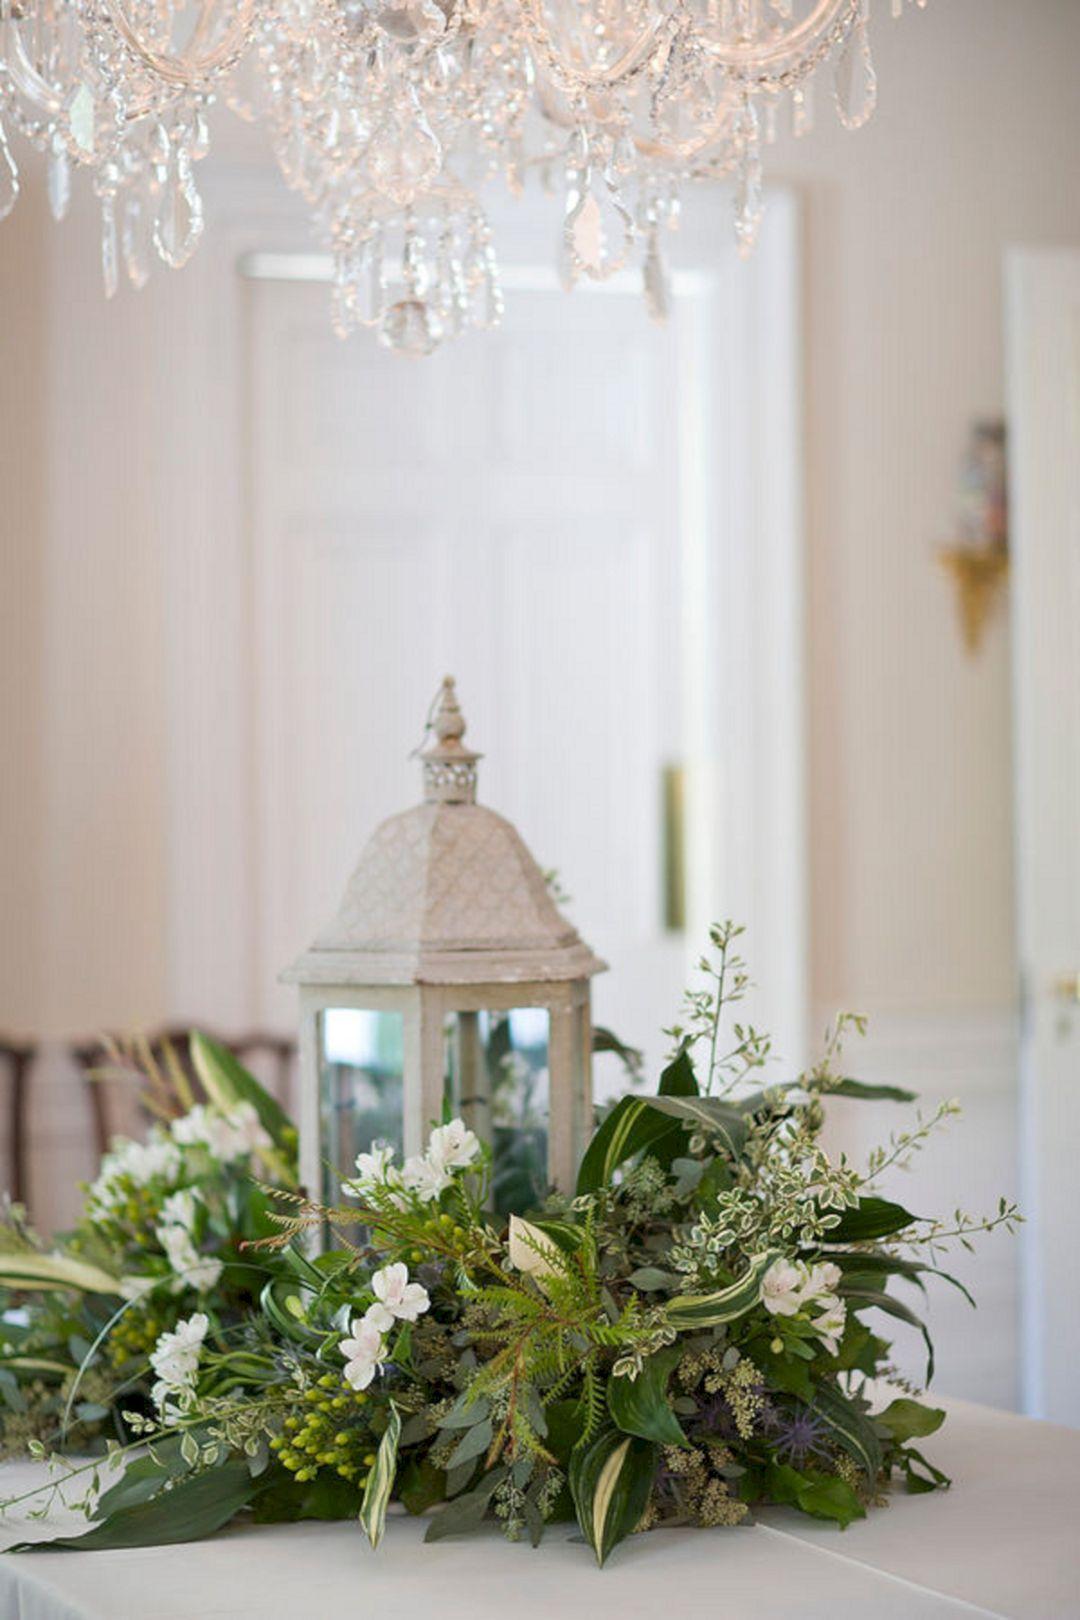 45+ Awesome Lantern Greenery Wedding Centerpiece Ideas | Pinterest ...